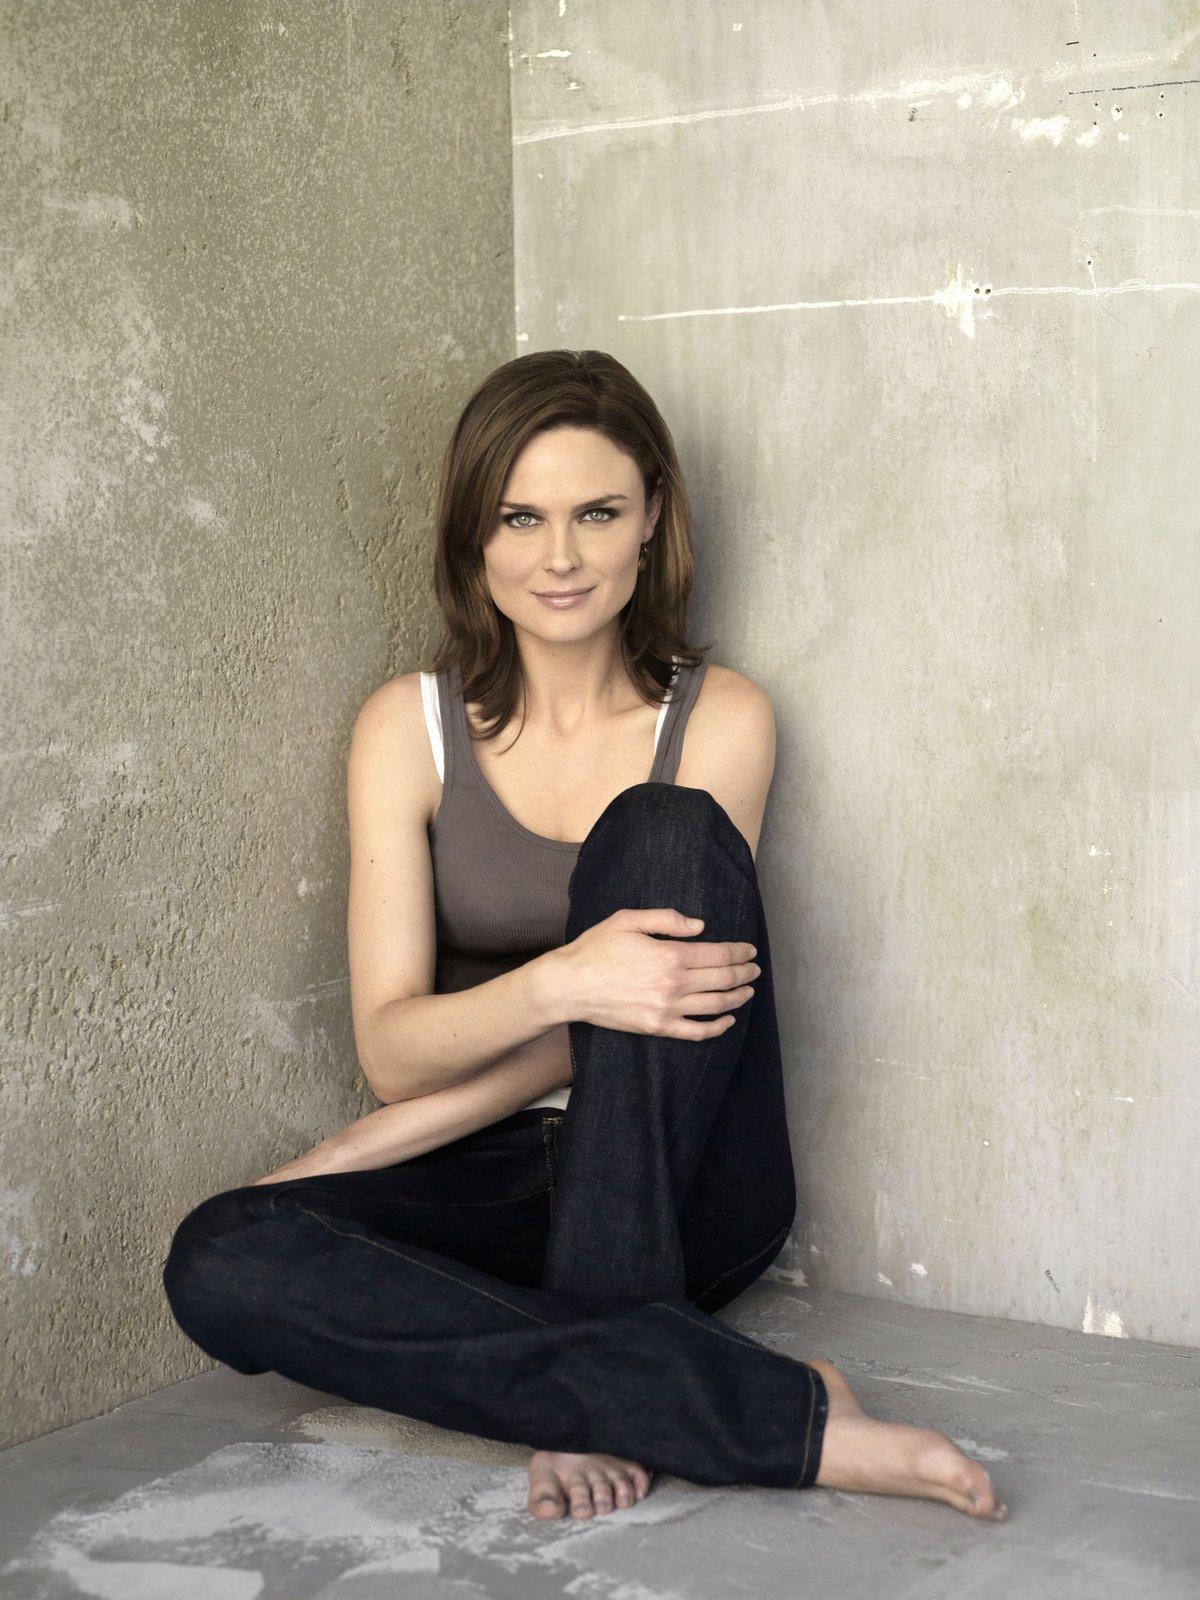 Remarkable, Emily deschanel naked feet consider